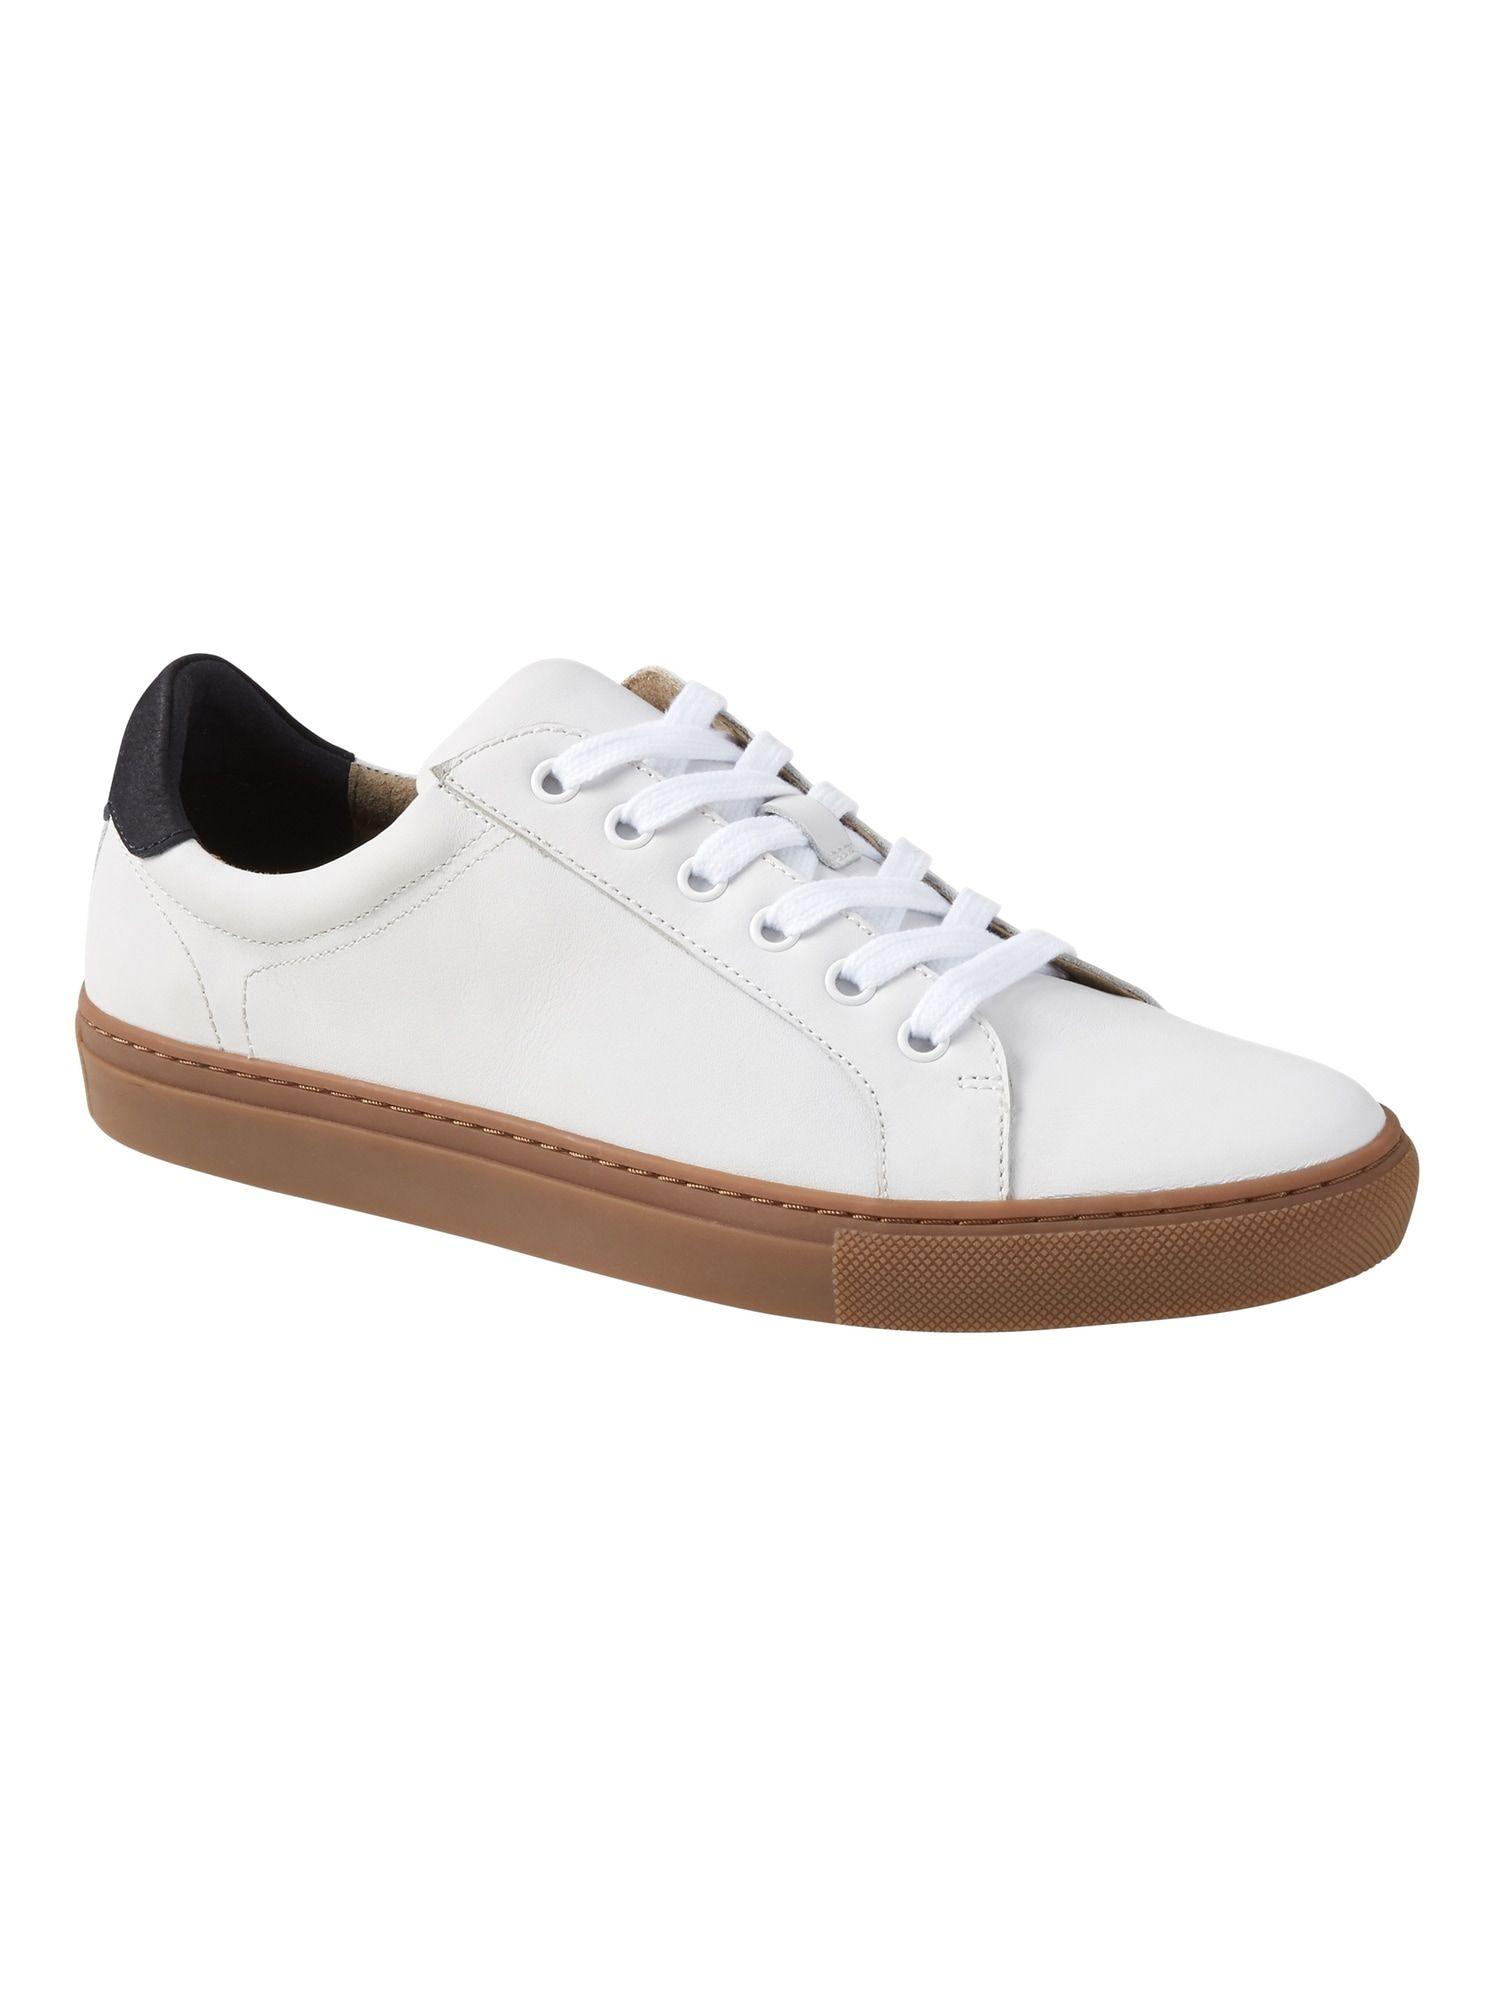 Nicklas Leather Sneaker | Banana